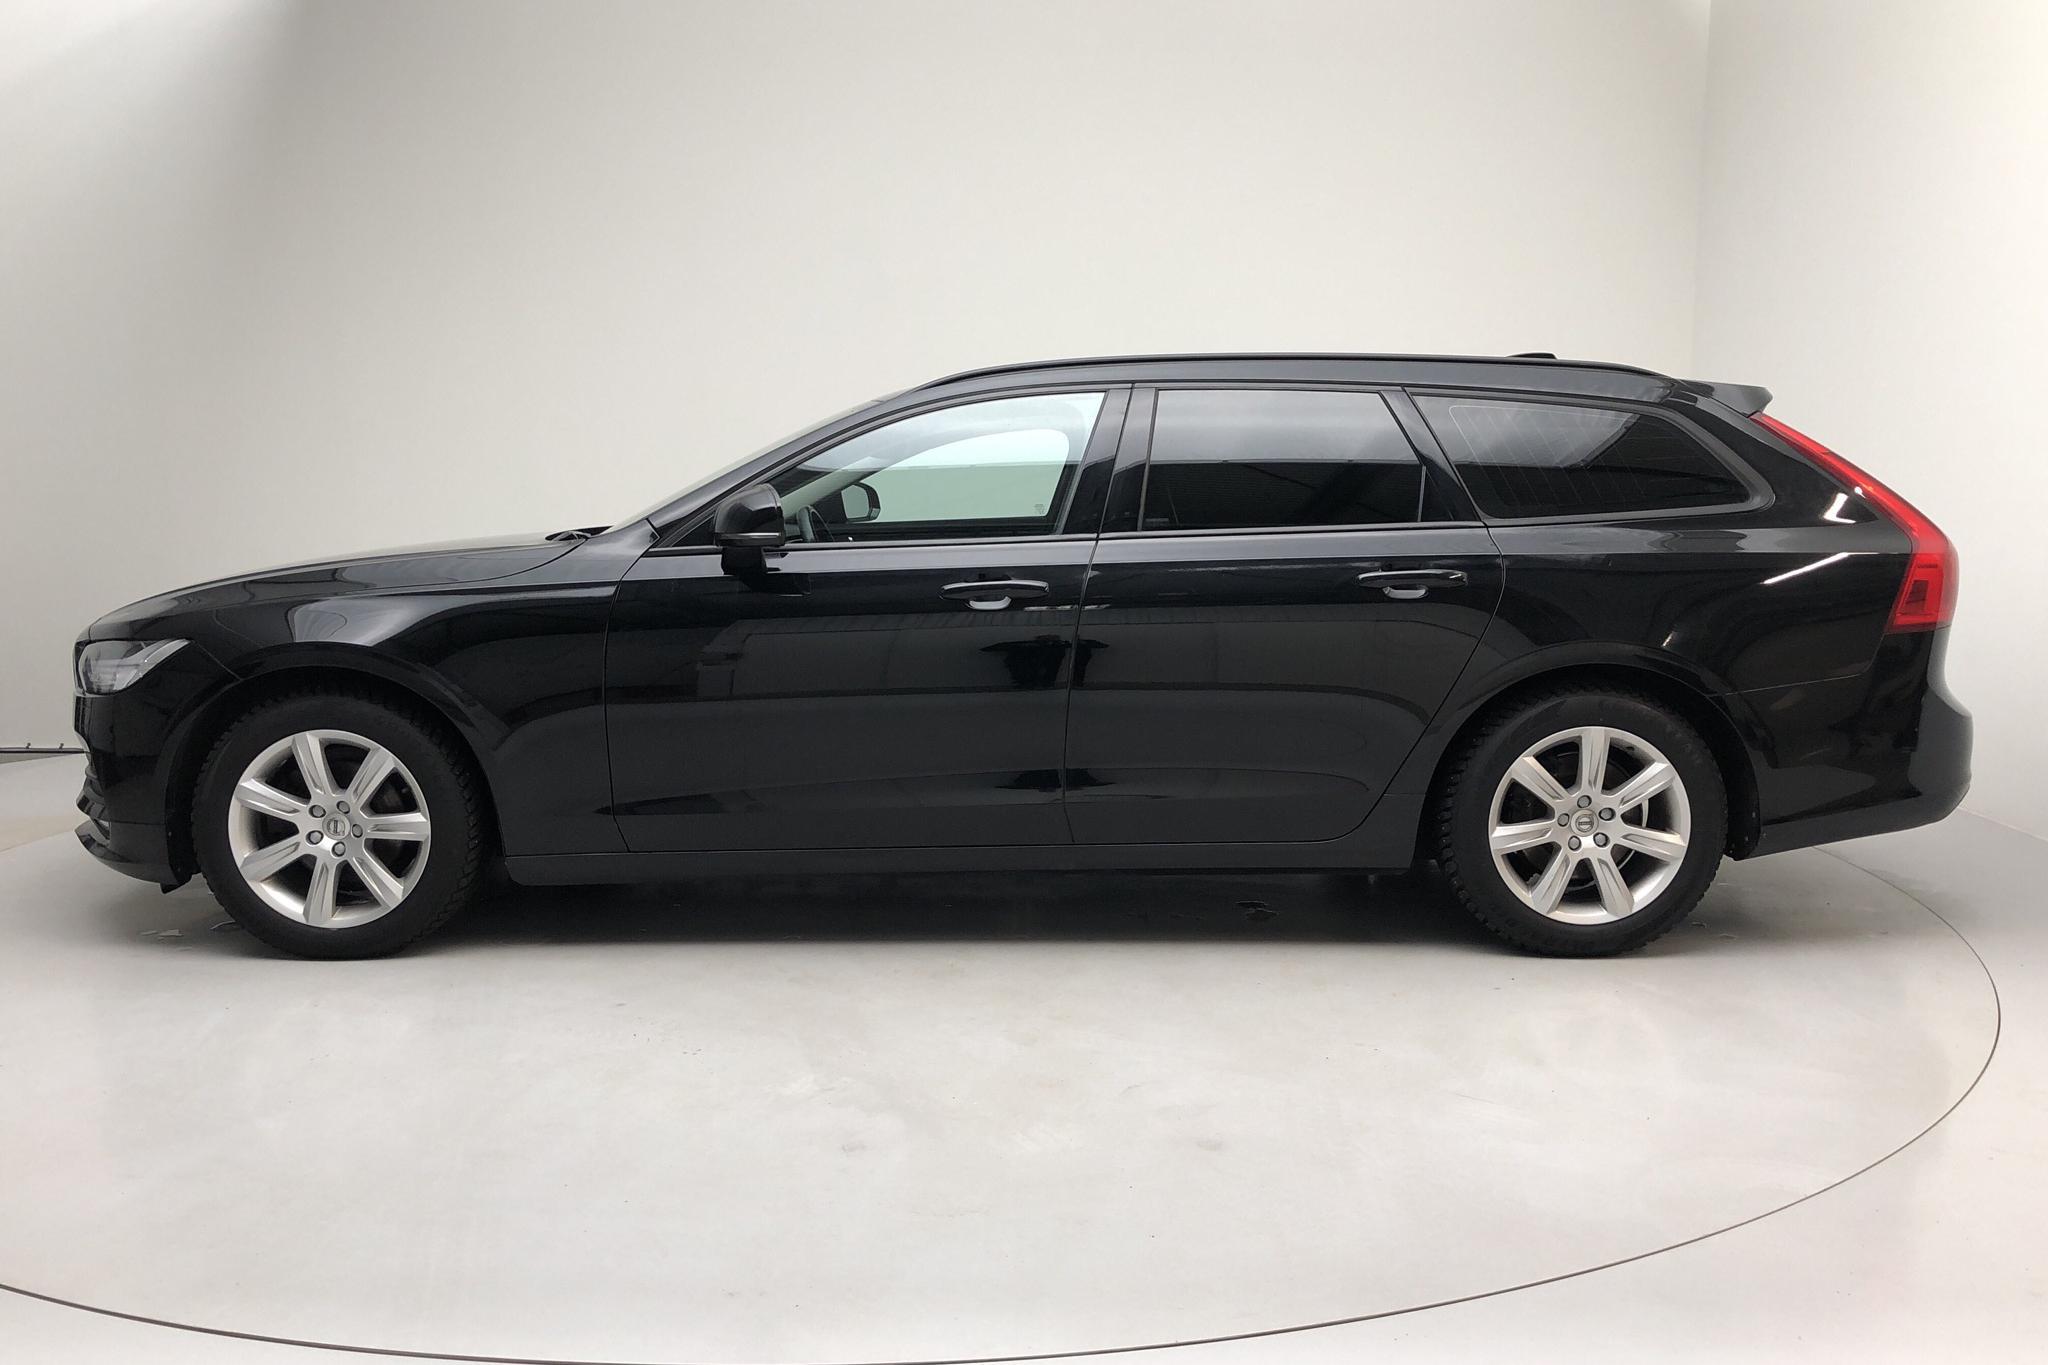 Volvo V90 D3 (150hk) - 83 550 km - Automatic - black - 2018